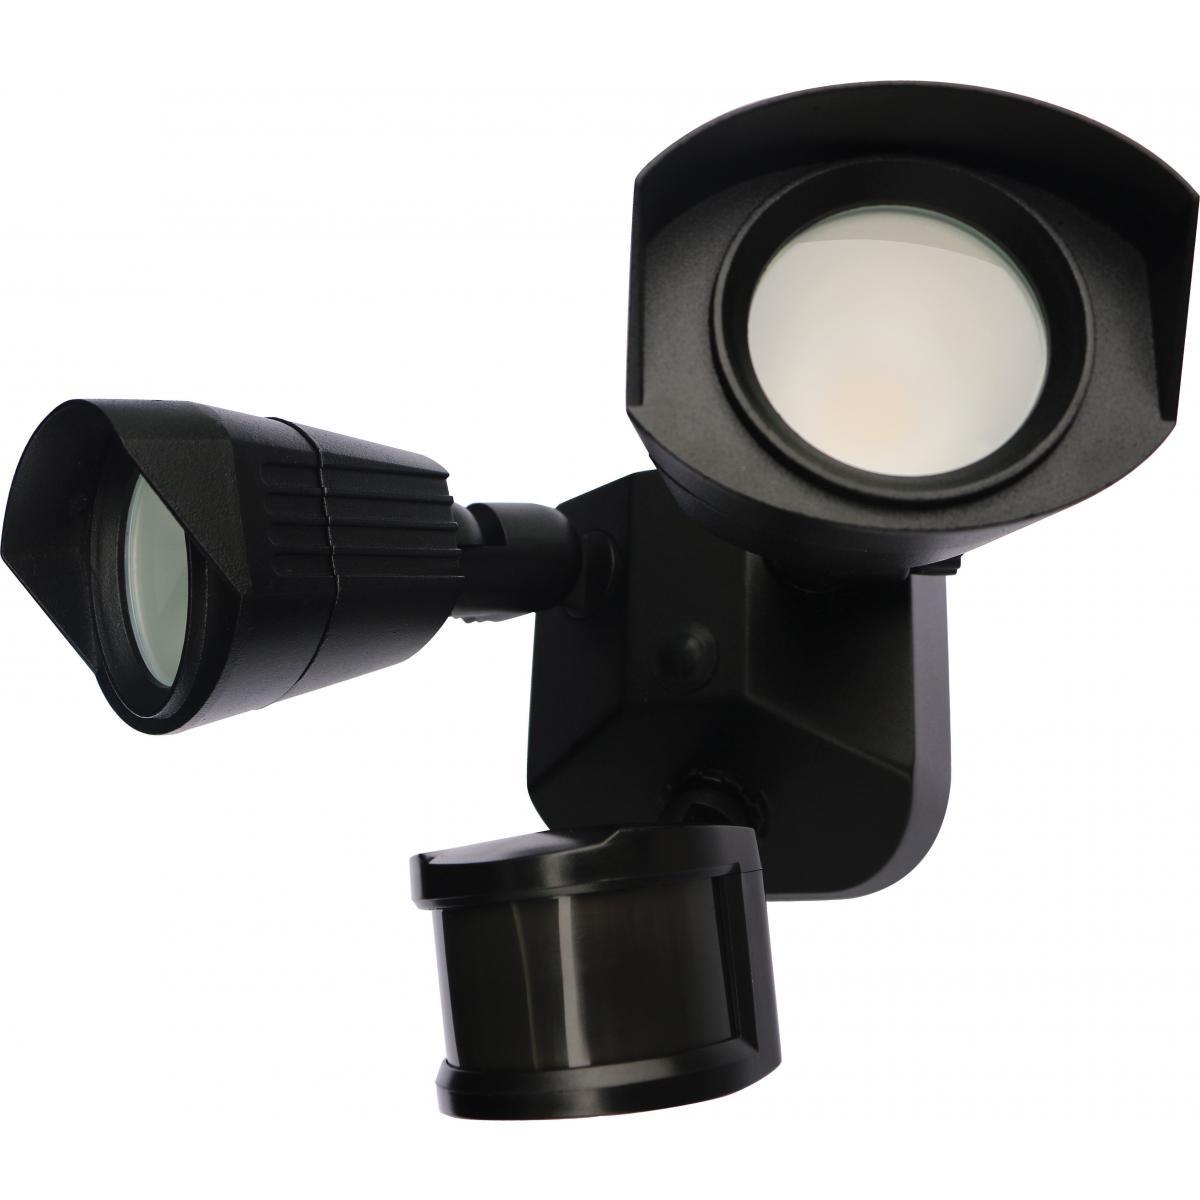 65-215 LED DUAL HEAD SECURITY LIGHT